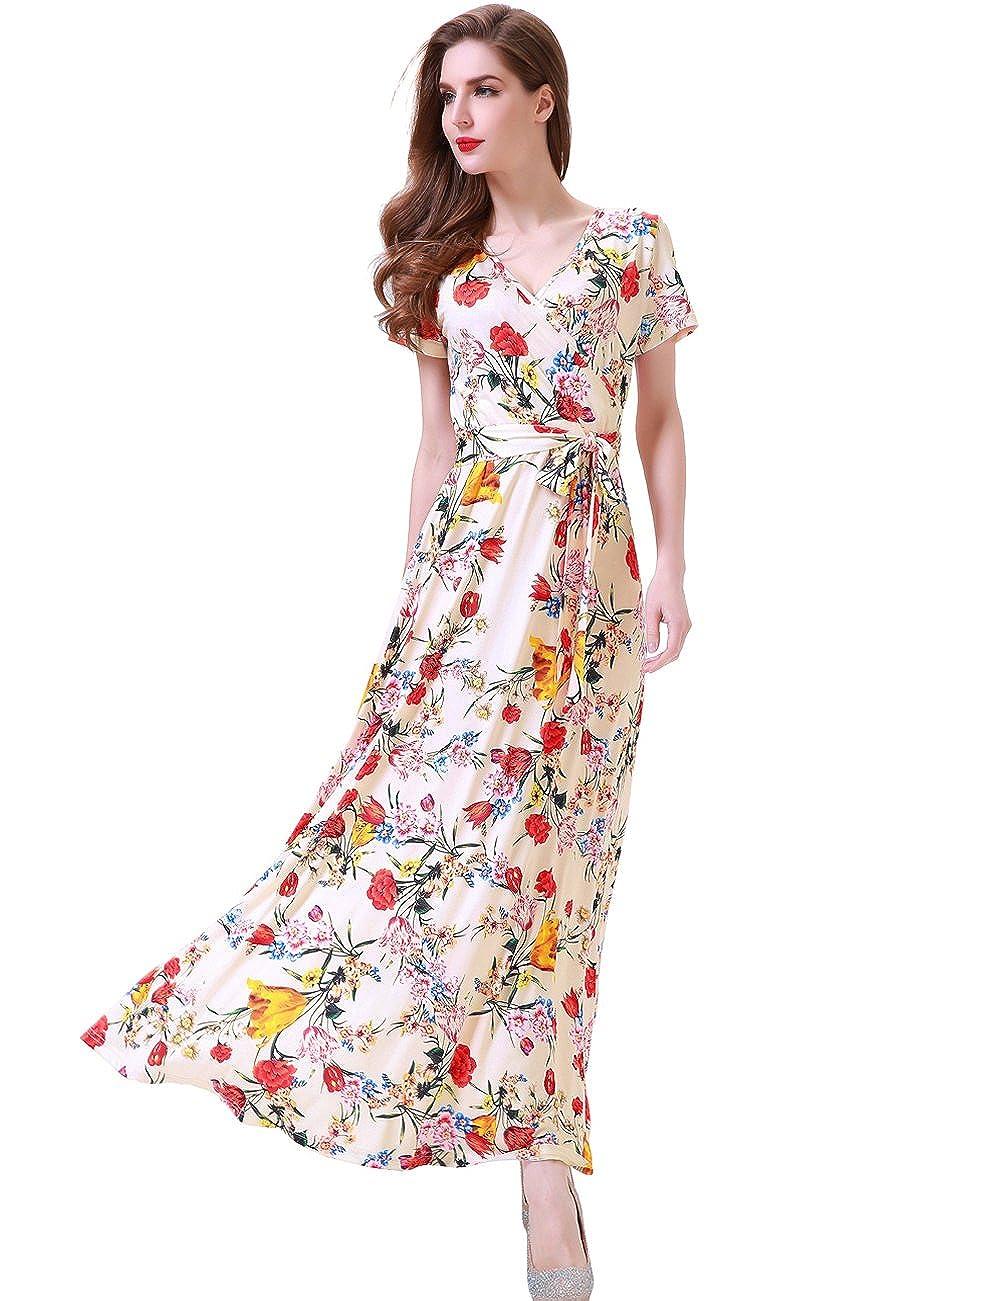 670c6d5b8f9 Melynnco Women s Short Sleeve Faux Wrap V Neck Cute Summer Floral Maxi Dress  at Amazon Women s Clothing store